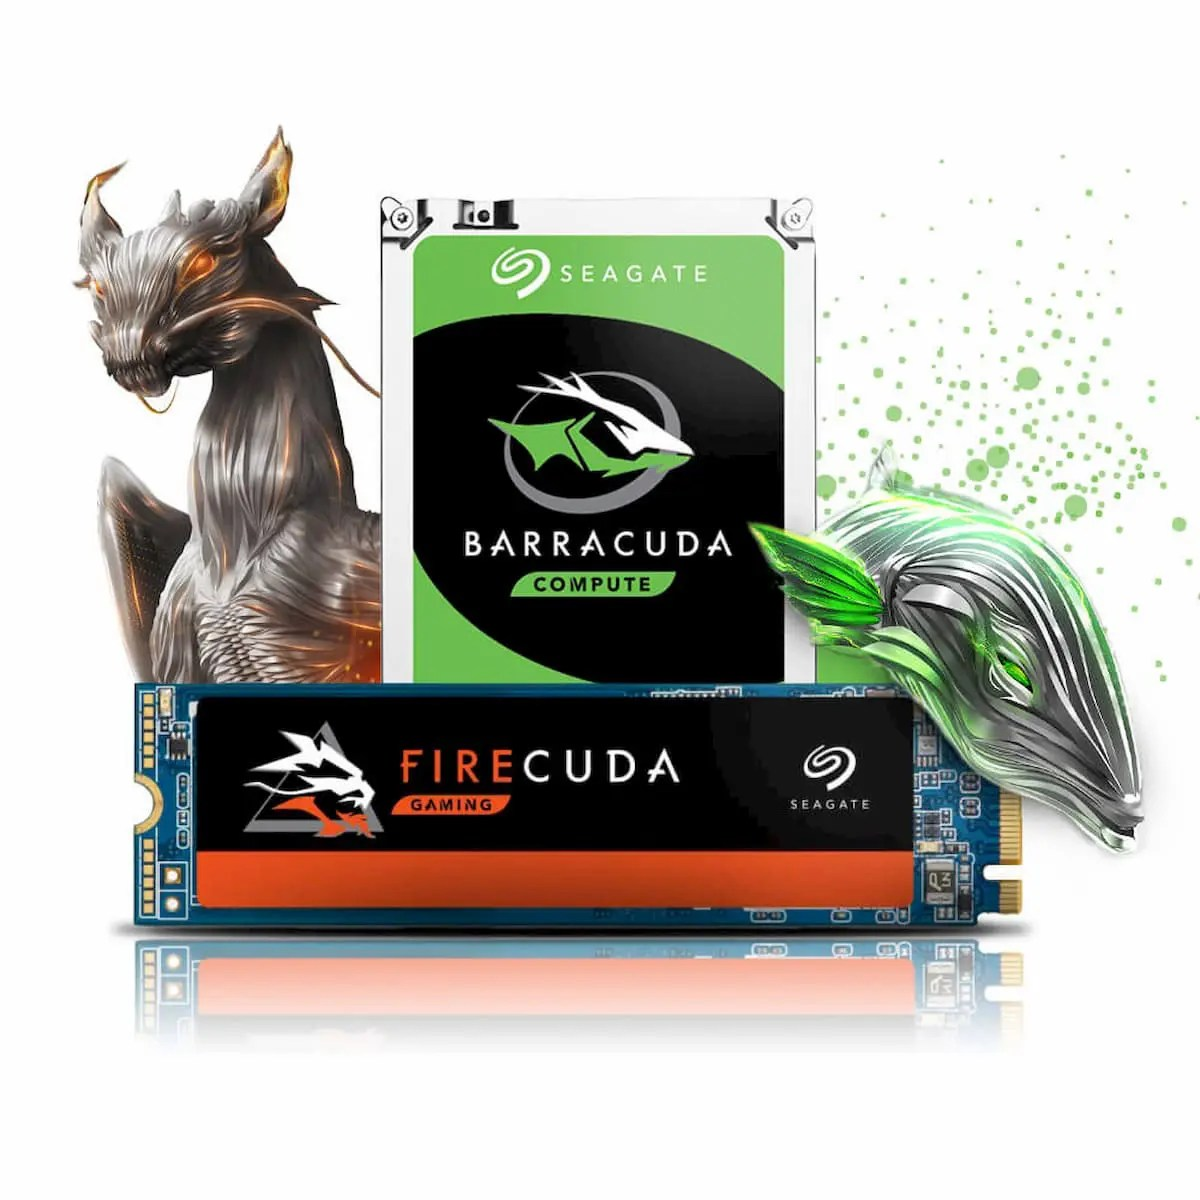 Seagate BarraCuda 1TB SSD